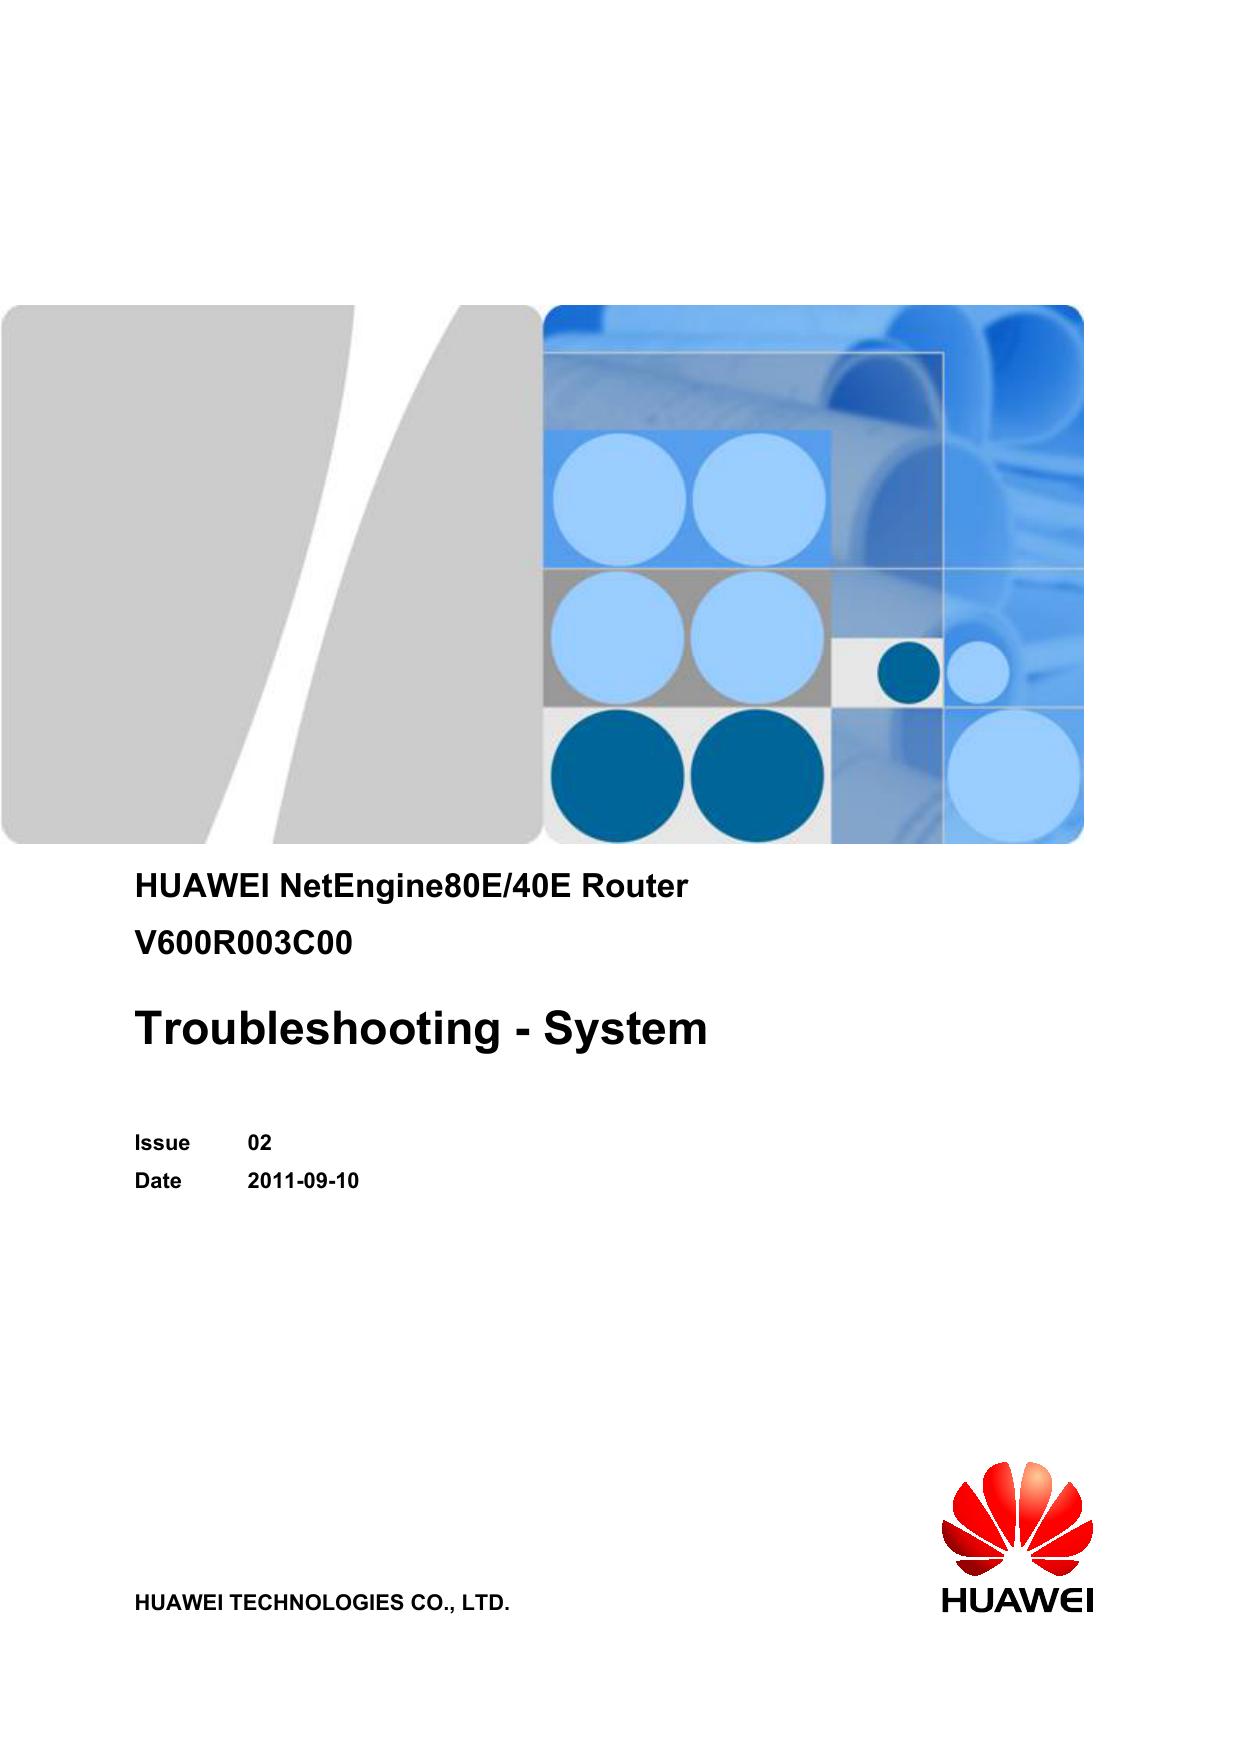 Troubleshooting - Huawei Enterprise | manualzz com